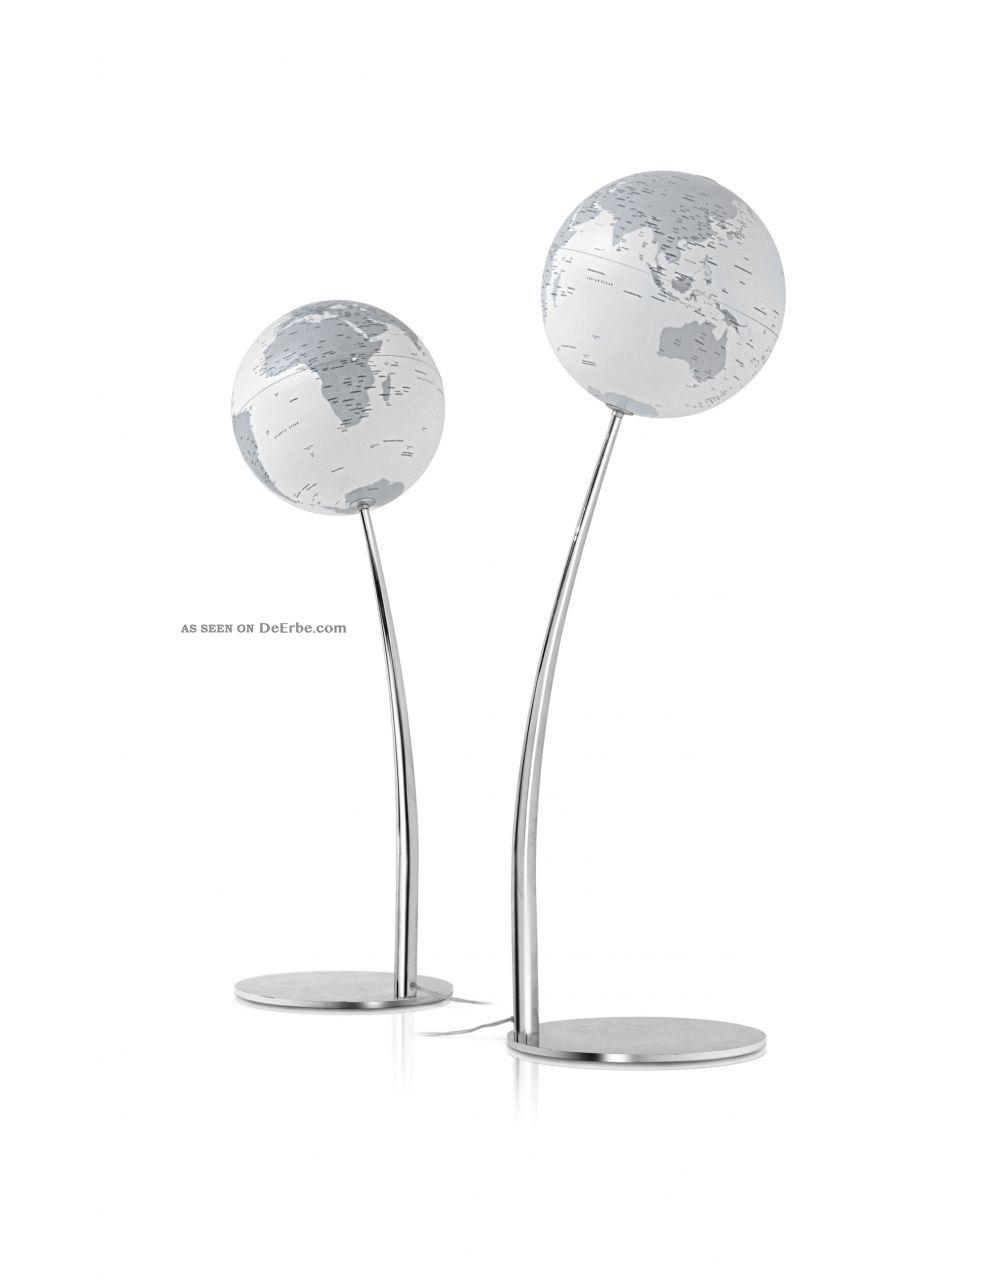 Designglobus Standglobus Leuchtglobus Atmosphere Globus Stem Reflection Globe Astronom. Instrumente, Globen Bild